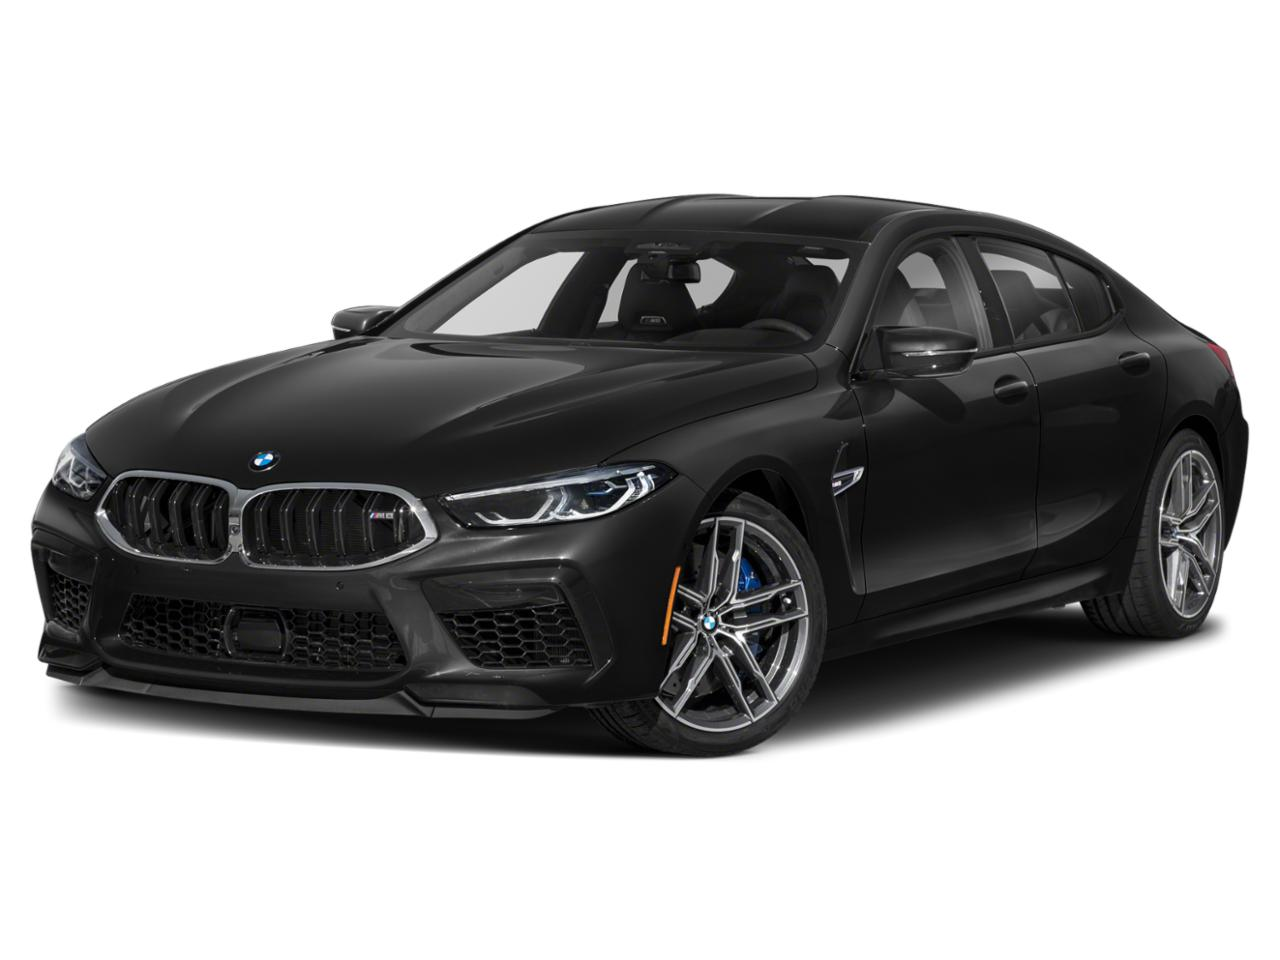 2021 BMW M8 Vehicle Photo in Grapevine, TX 76051